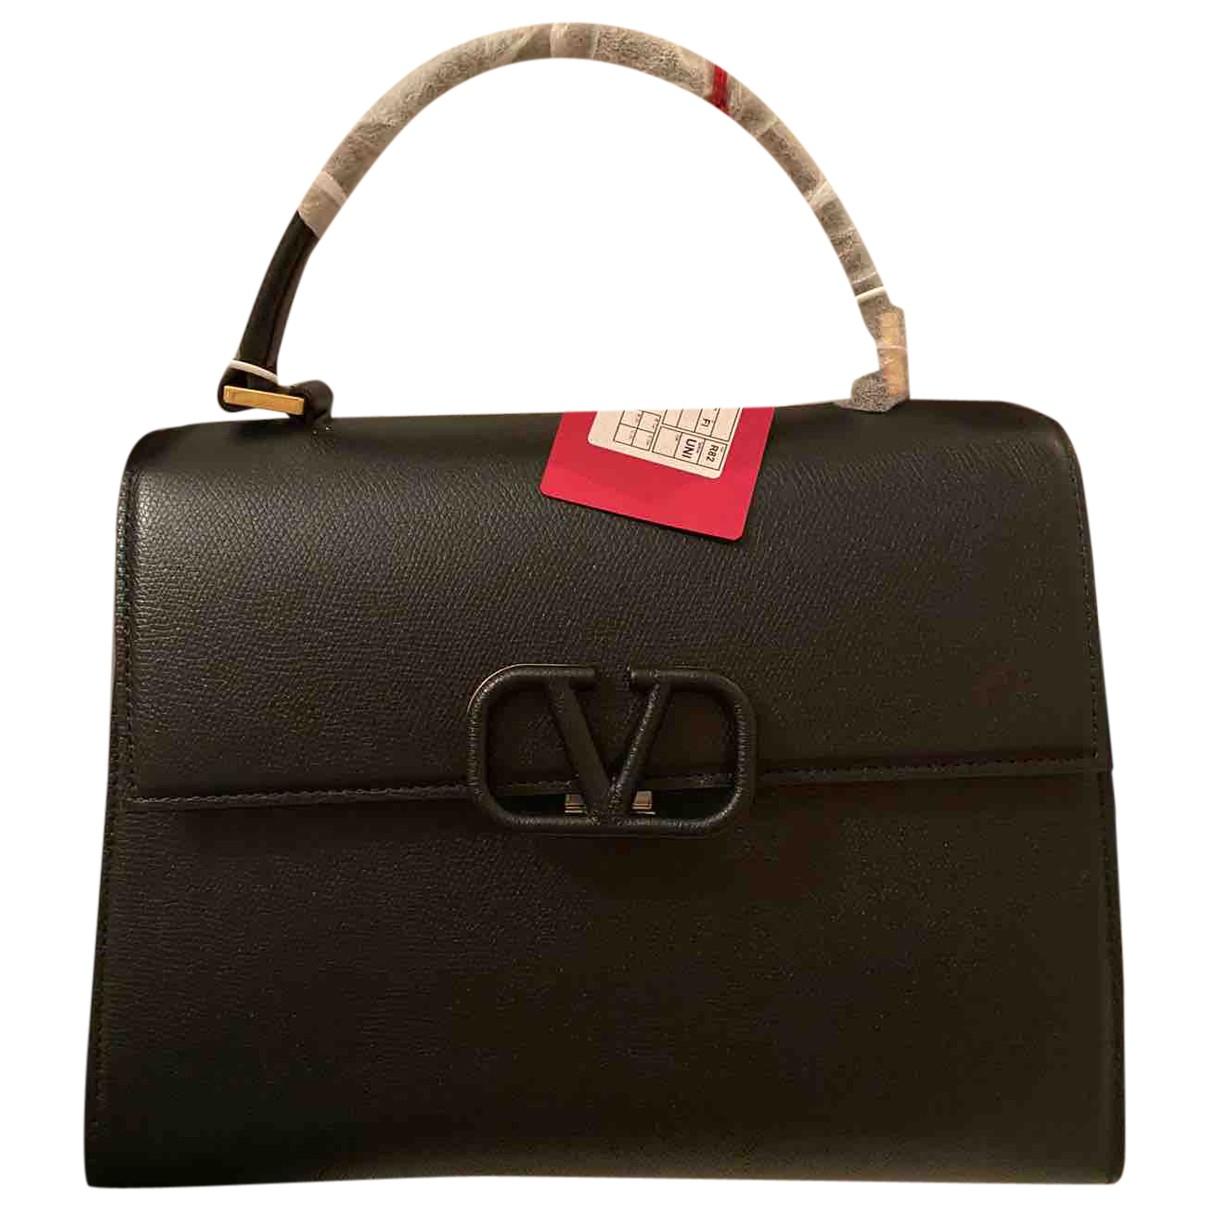 Valentino Garavani - Sac a main Vsling pour femme en cuir - noir